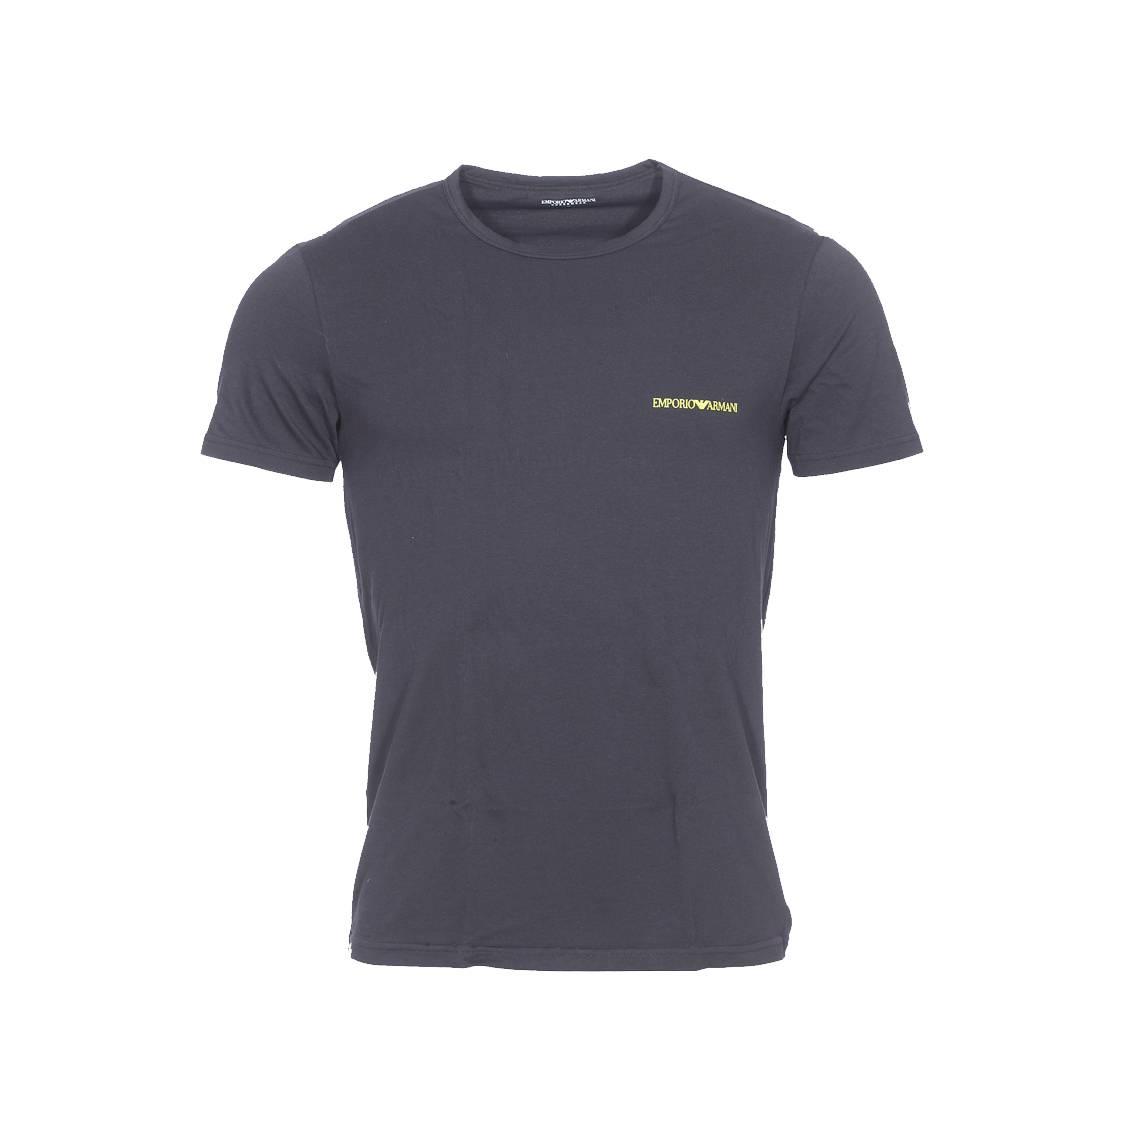 Tee-shirt col rond  en coton stretch noir, logo jaune